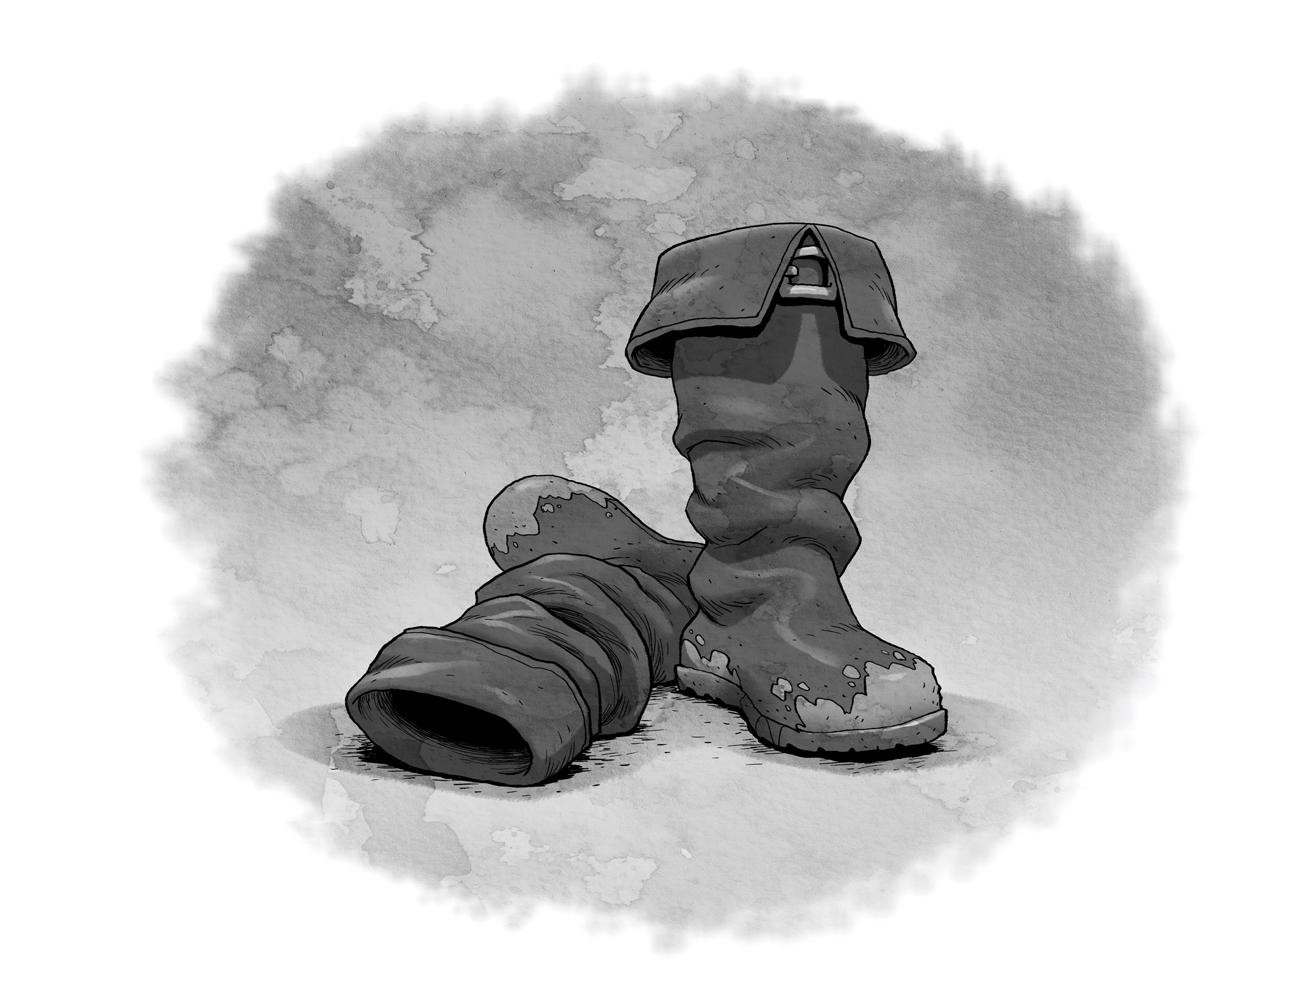 LU3_020_Boots.jpg